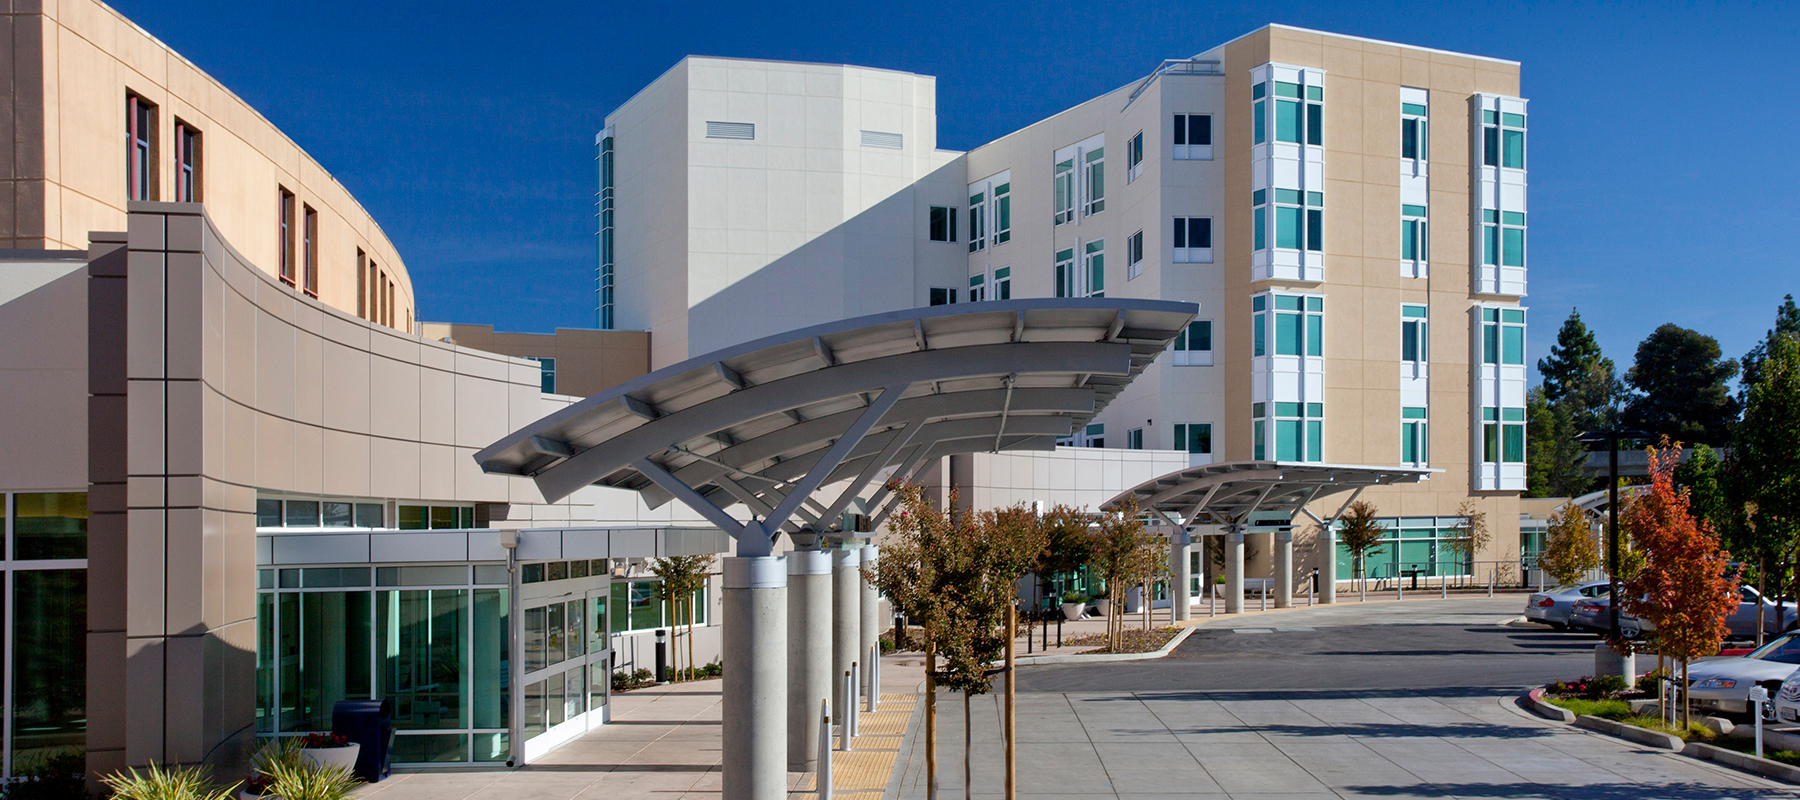 Concord Medical Center